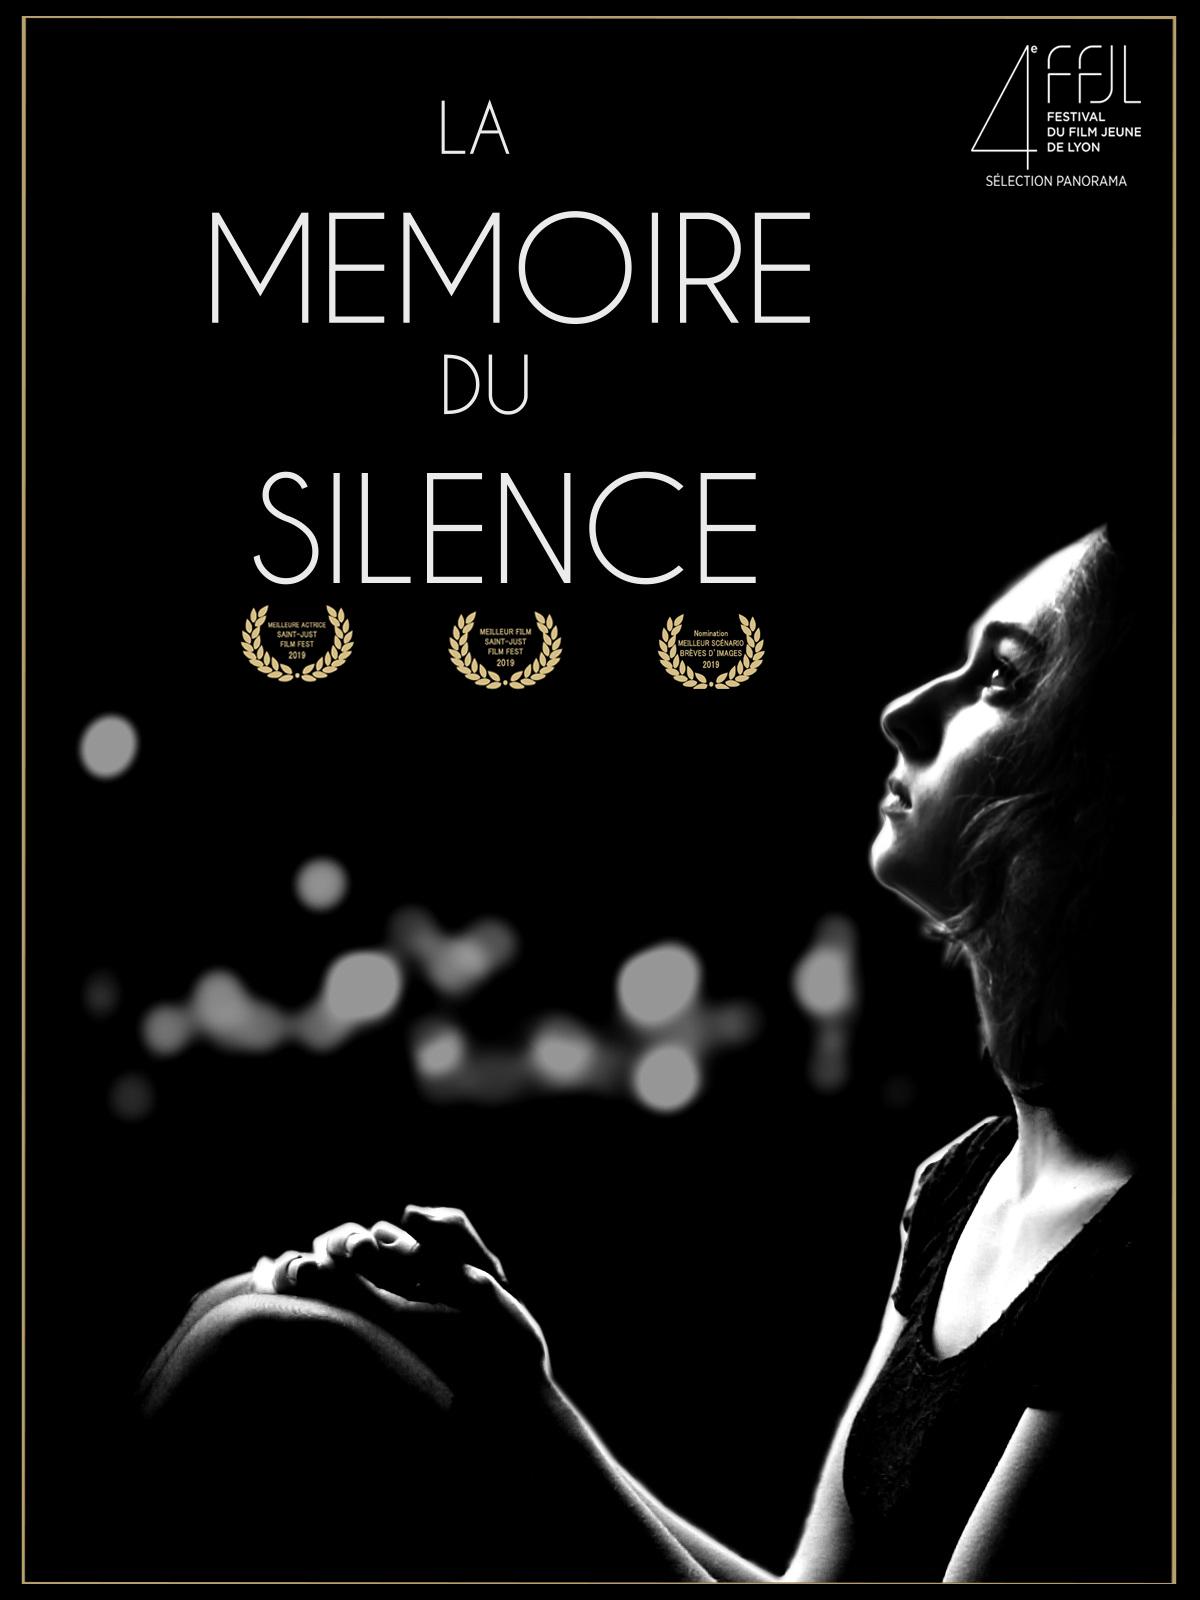 La Memoire Du Silence 2018 Imdb